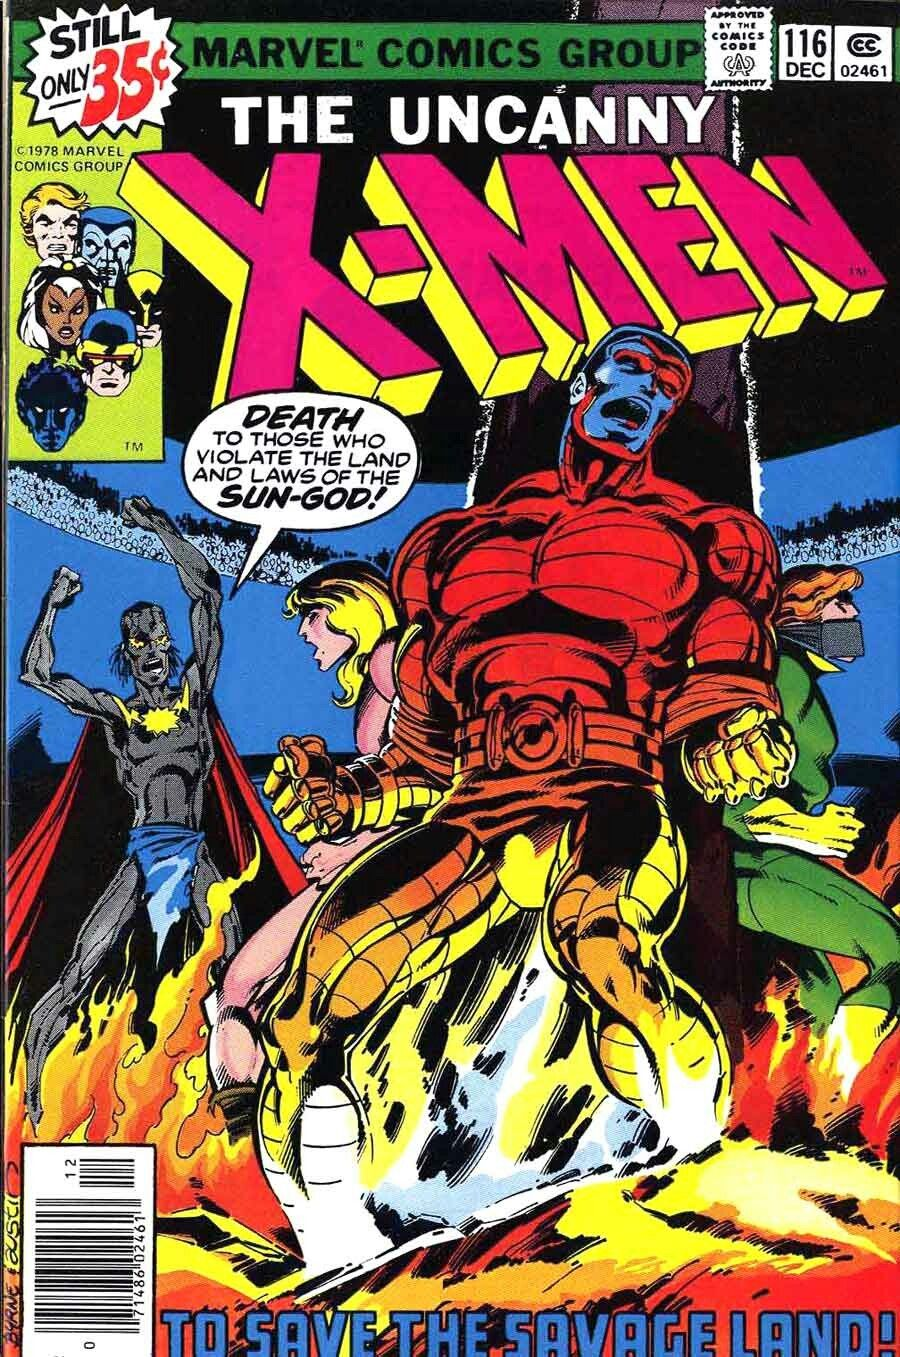 The Uncanny X Men 116 Comic Book Covers Comics Comic Covers